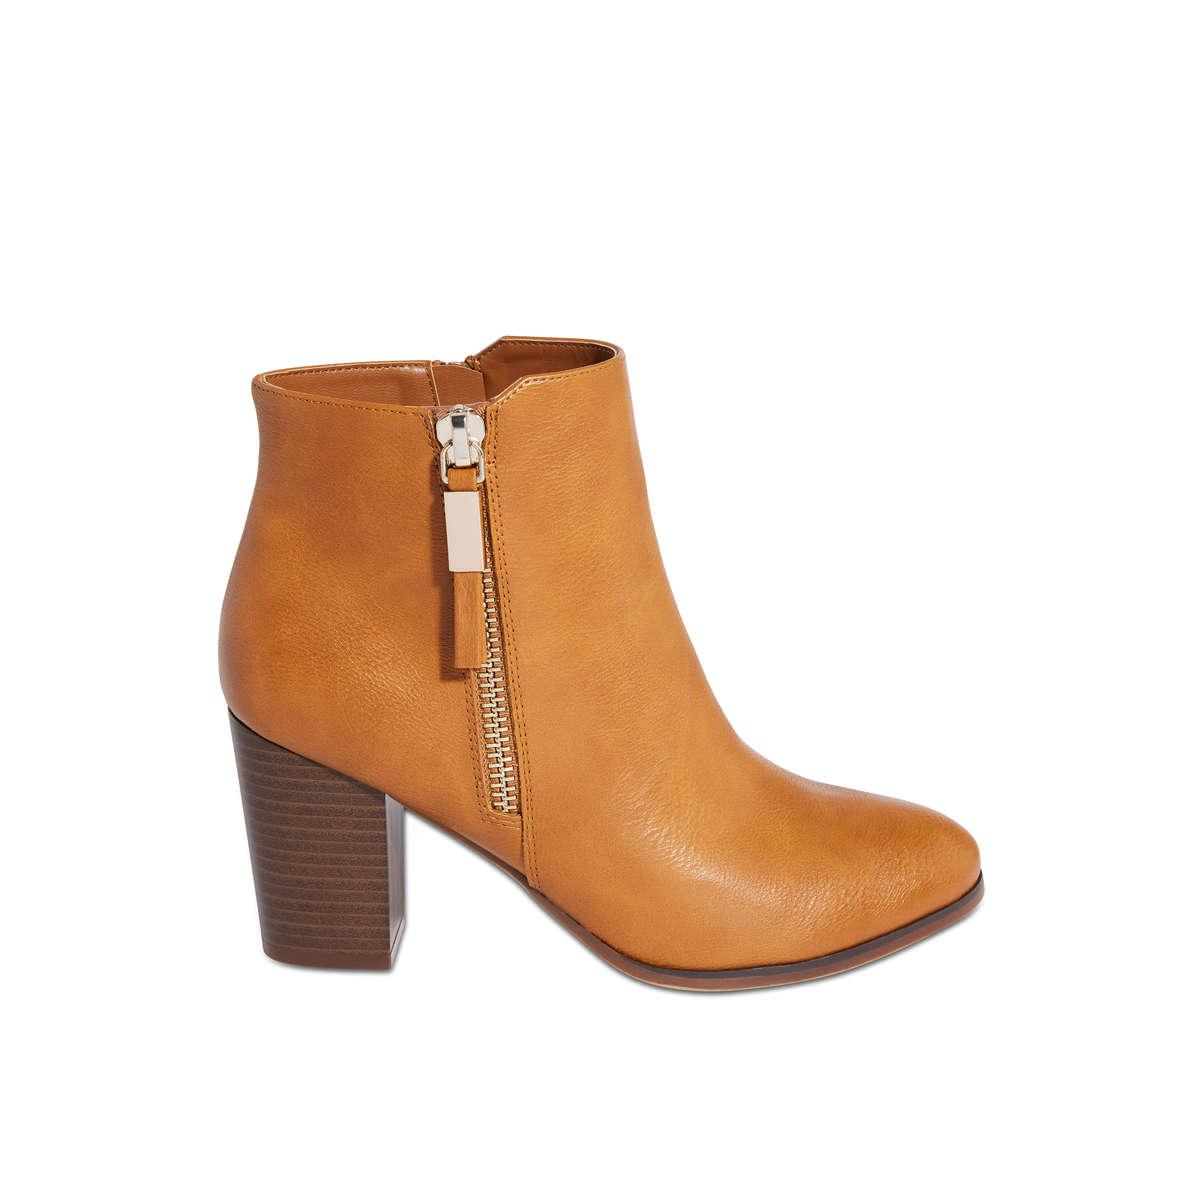 427a473dc4e8 Lyst - Joe Fresh Block Heel Side Zip Bootie in Brown